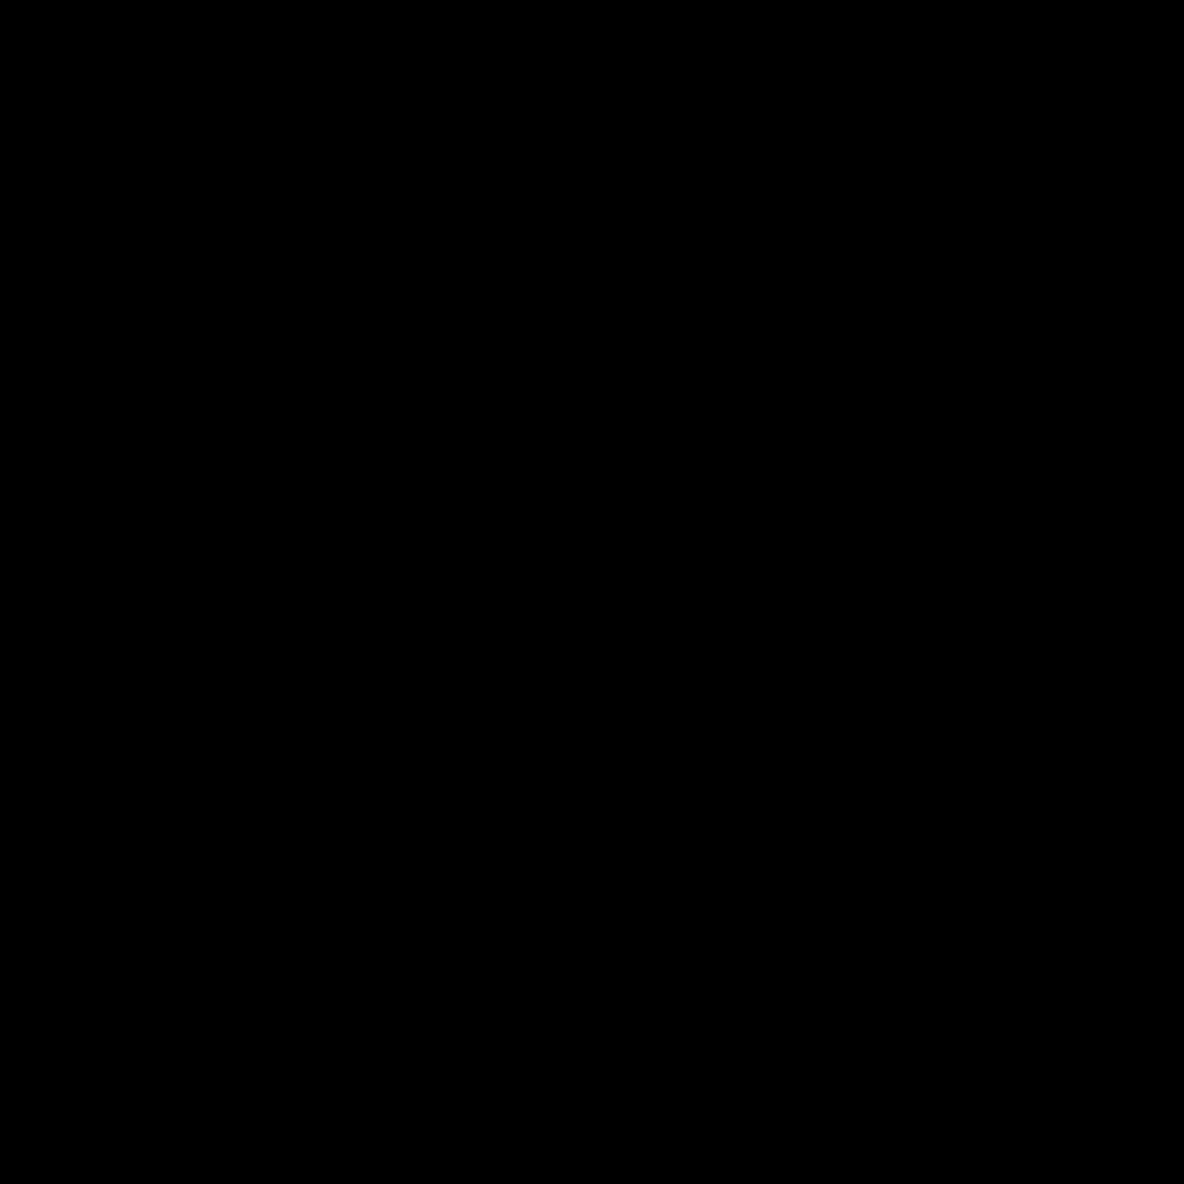 Pixilart New Roblox Logo 2019 By Anonymous